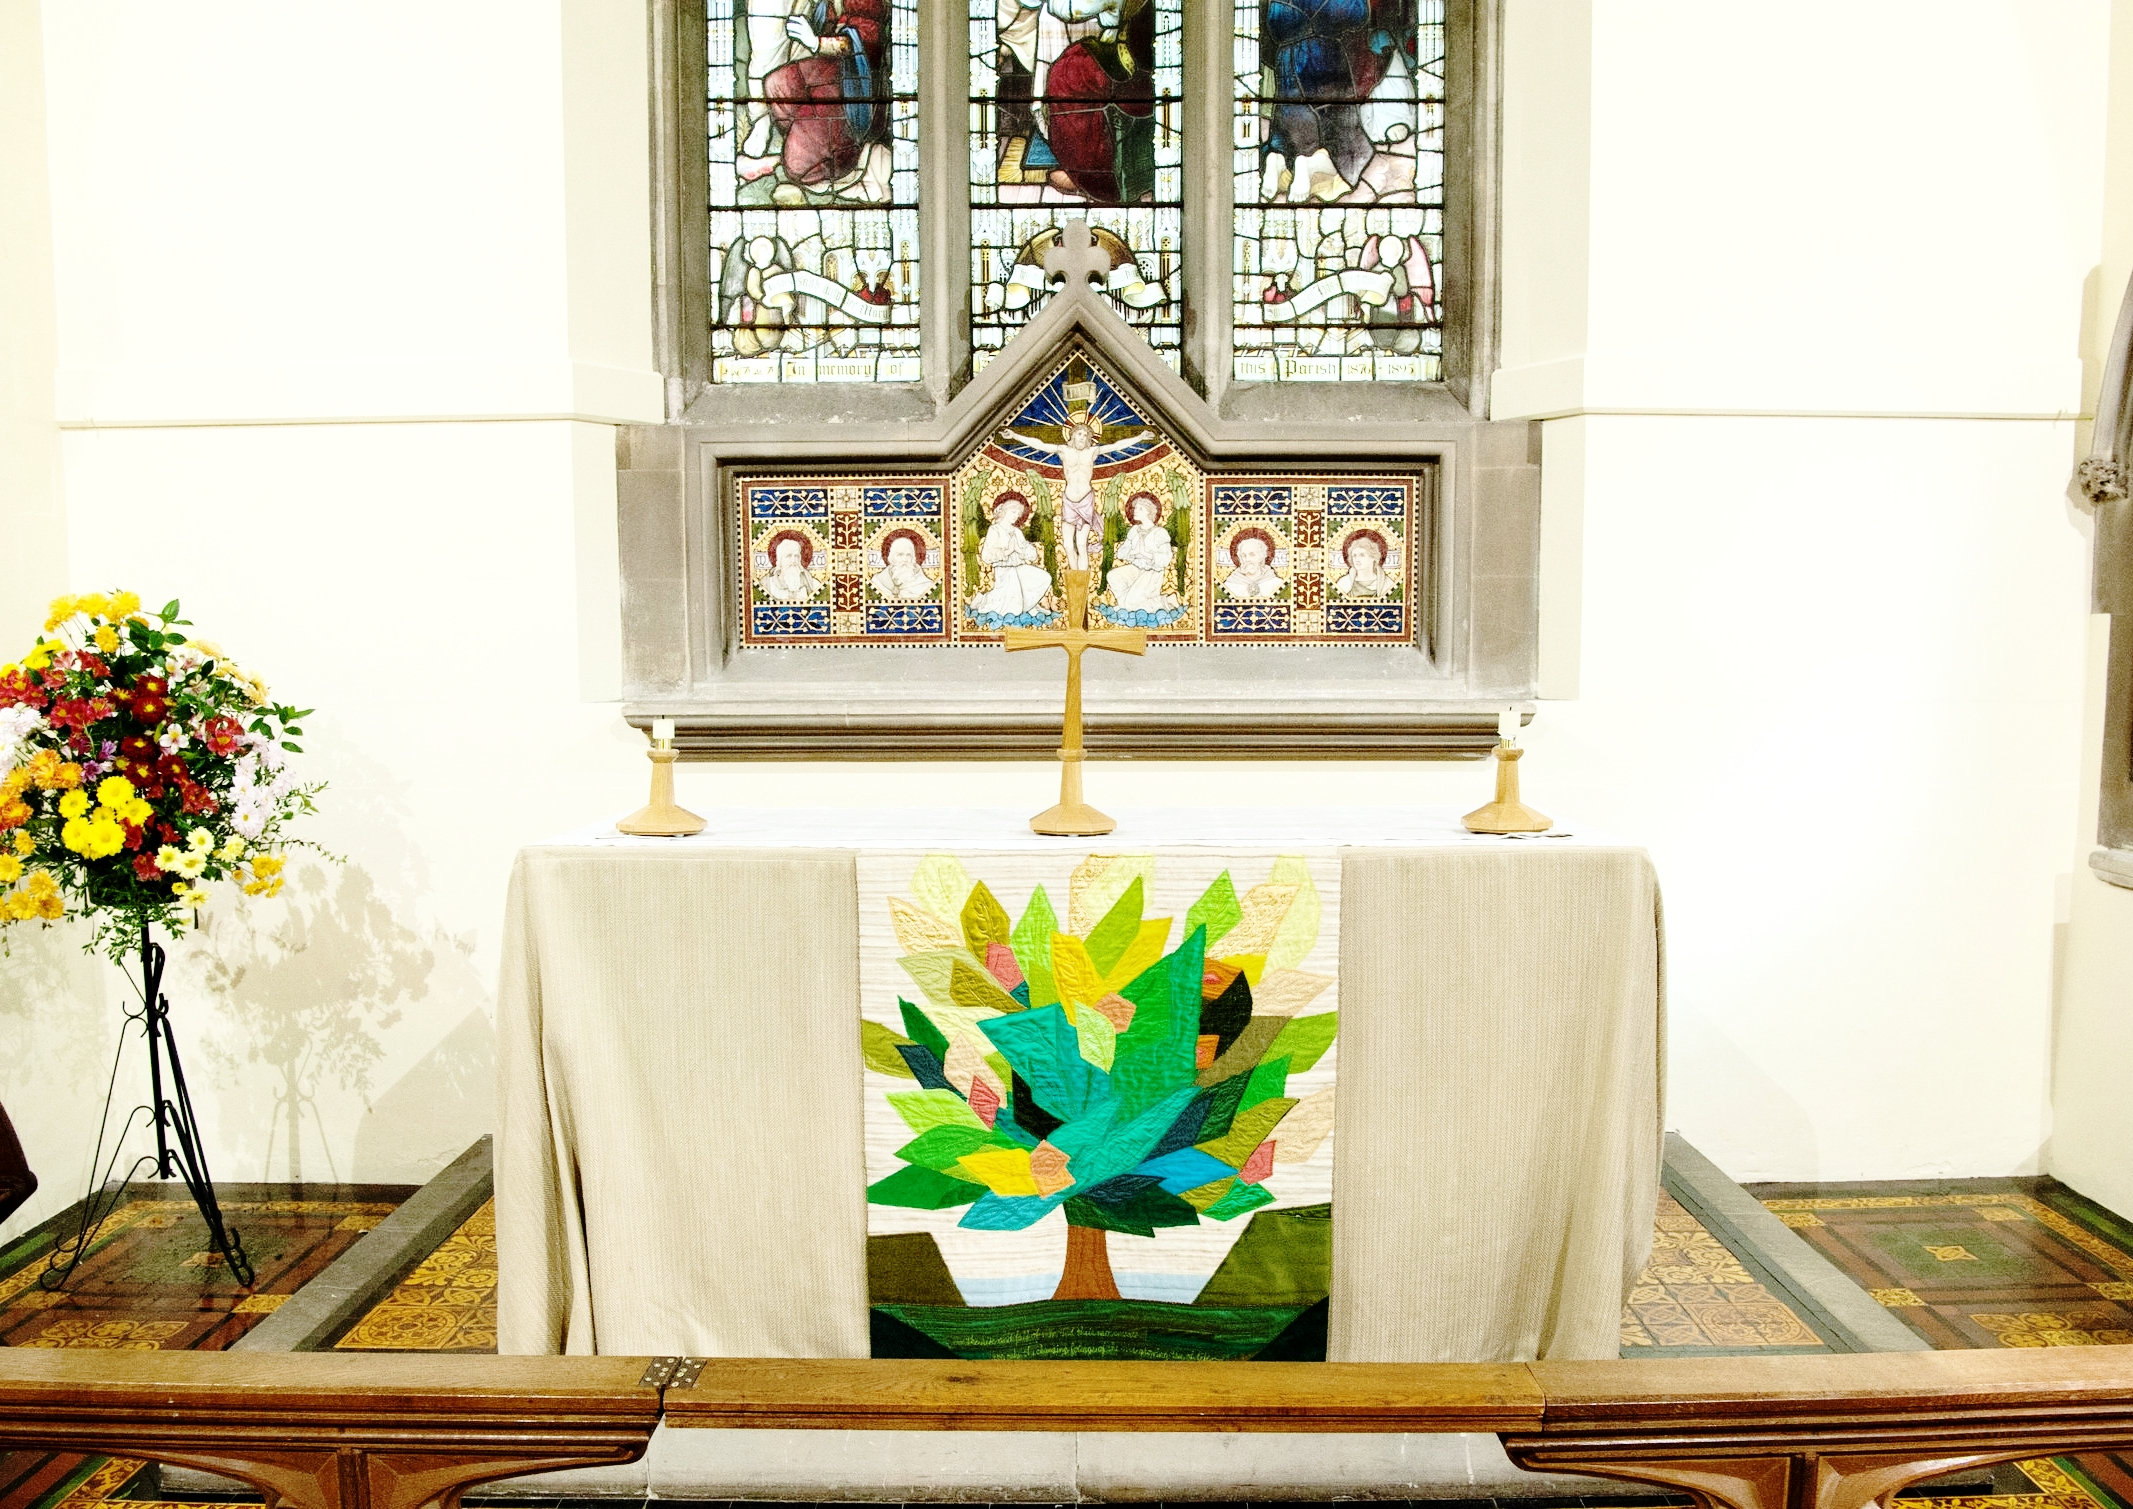 St Martin's Church Bladon, Altar